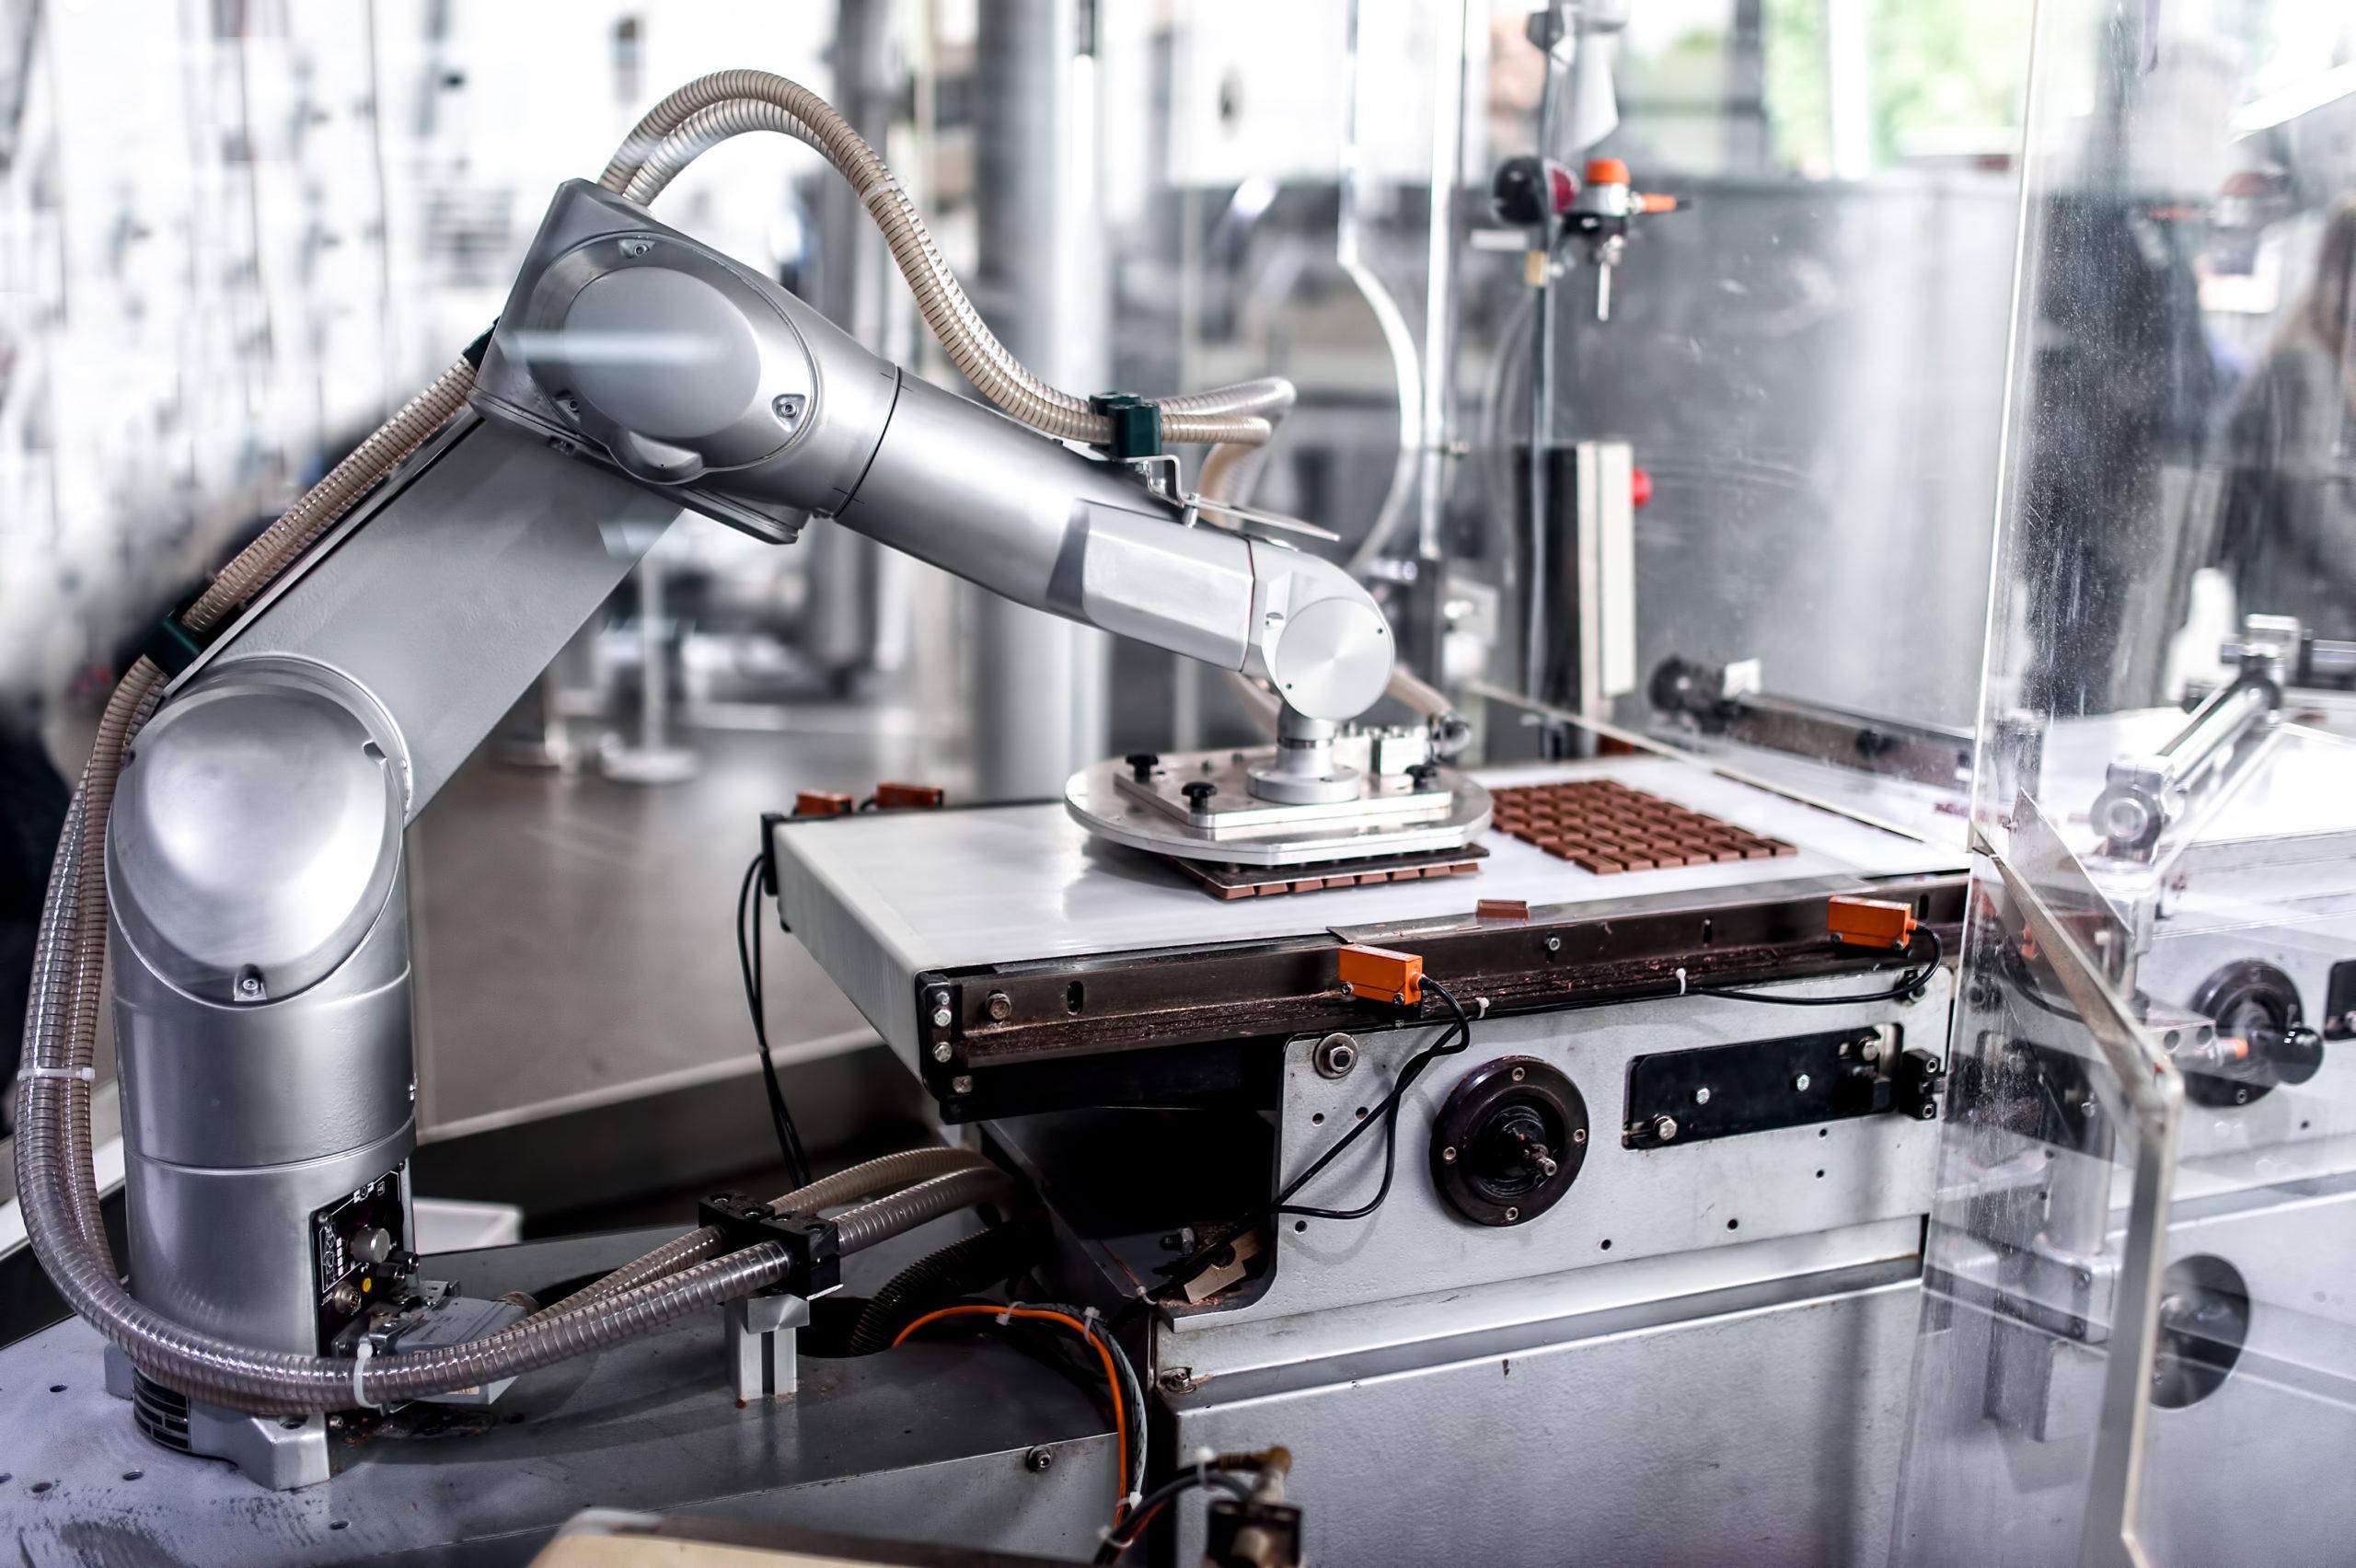 Robotic Total Hip Arthroplasty